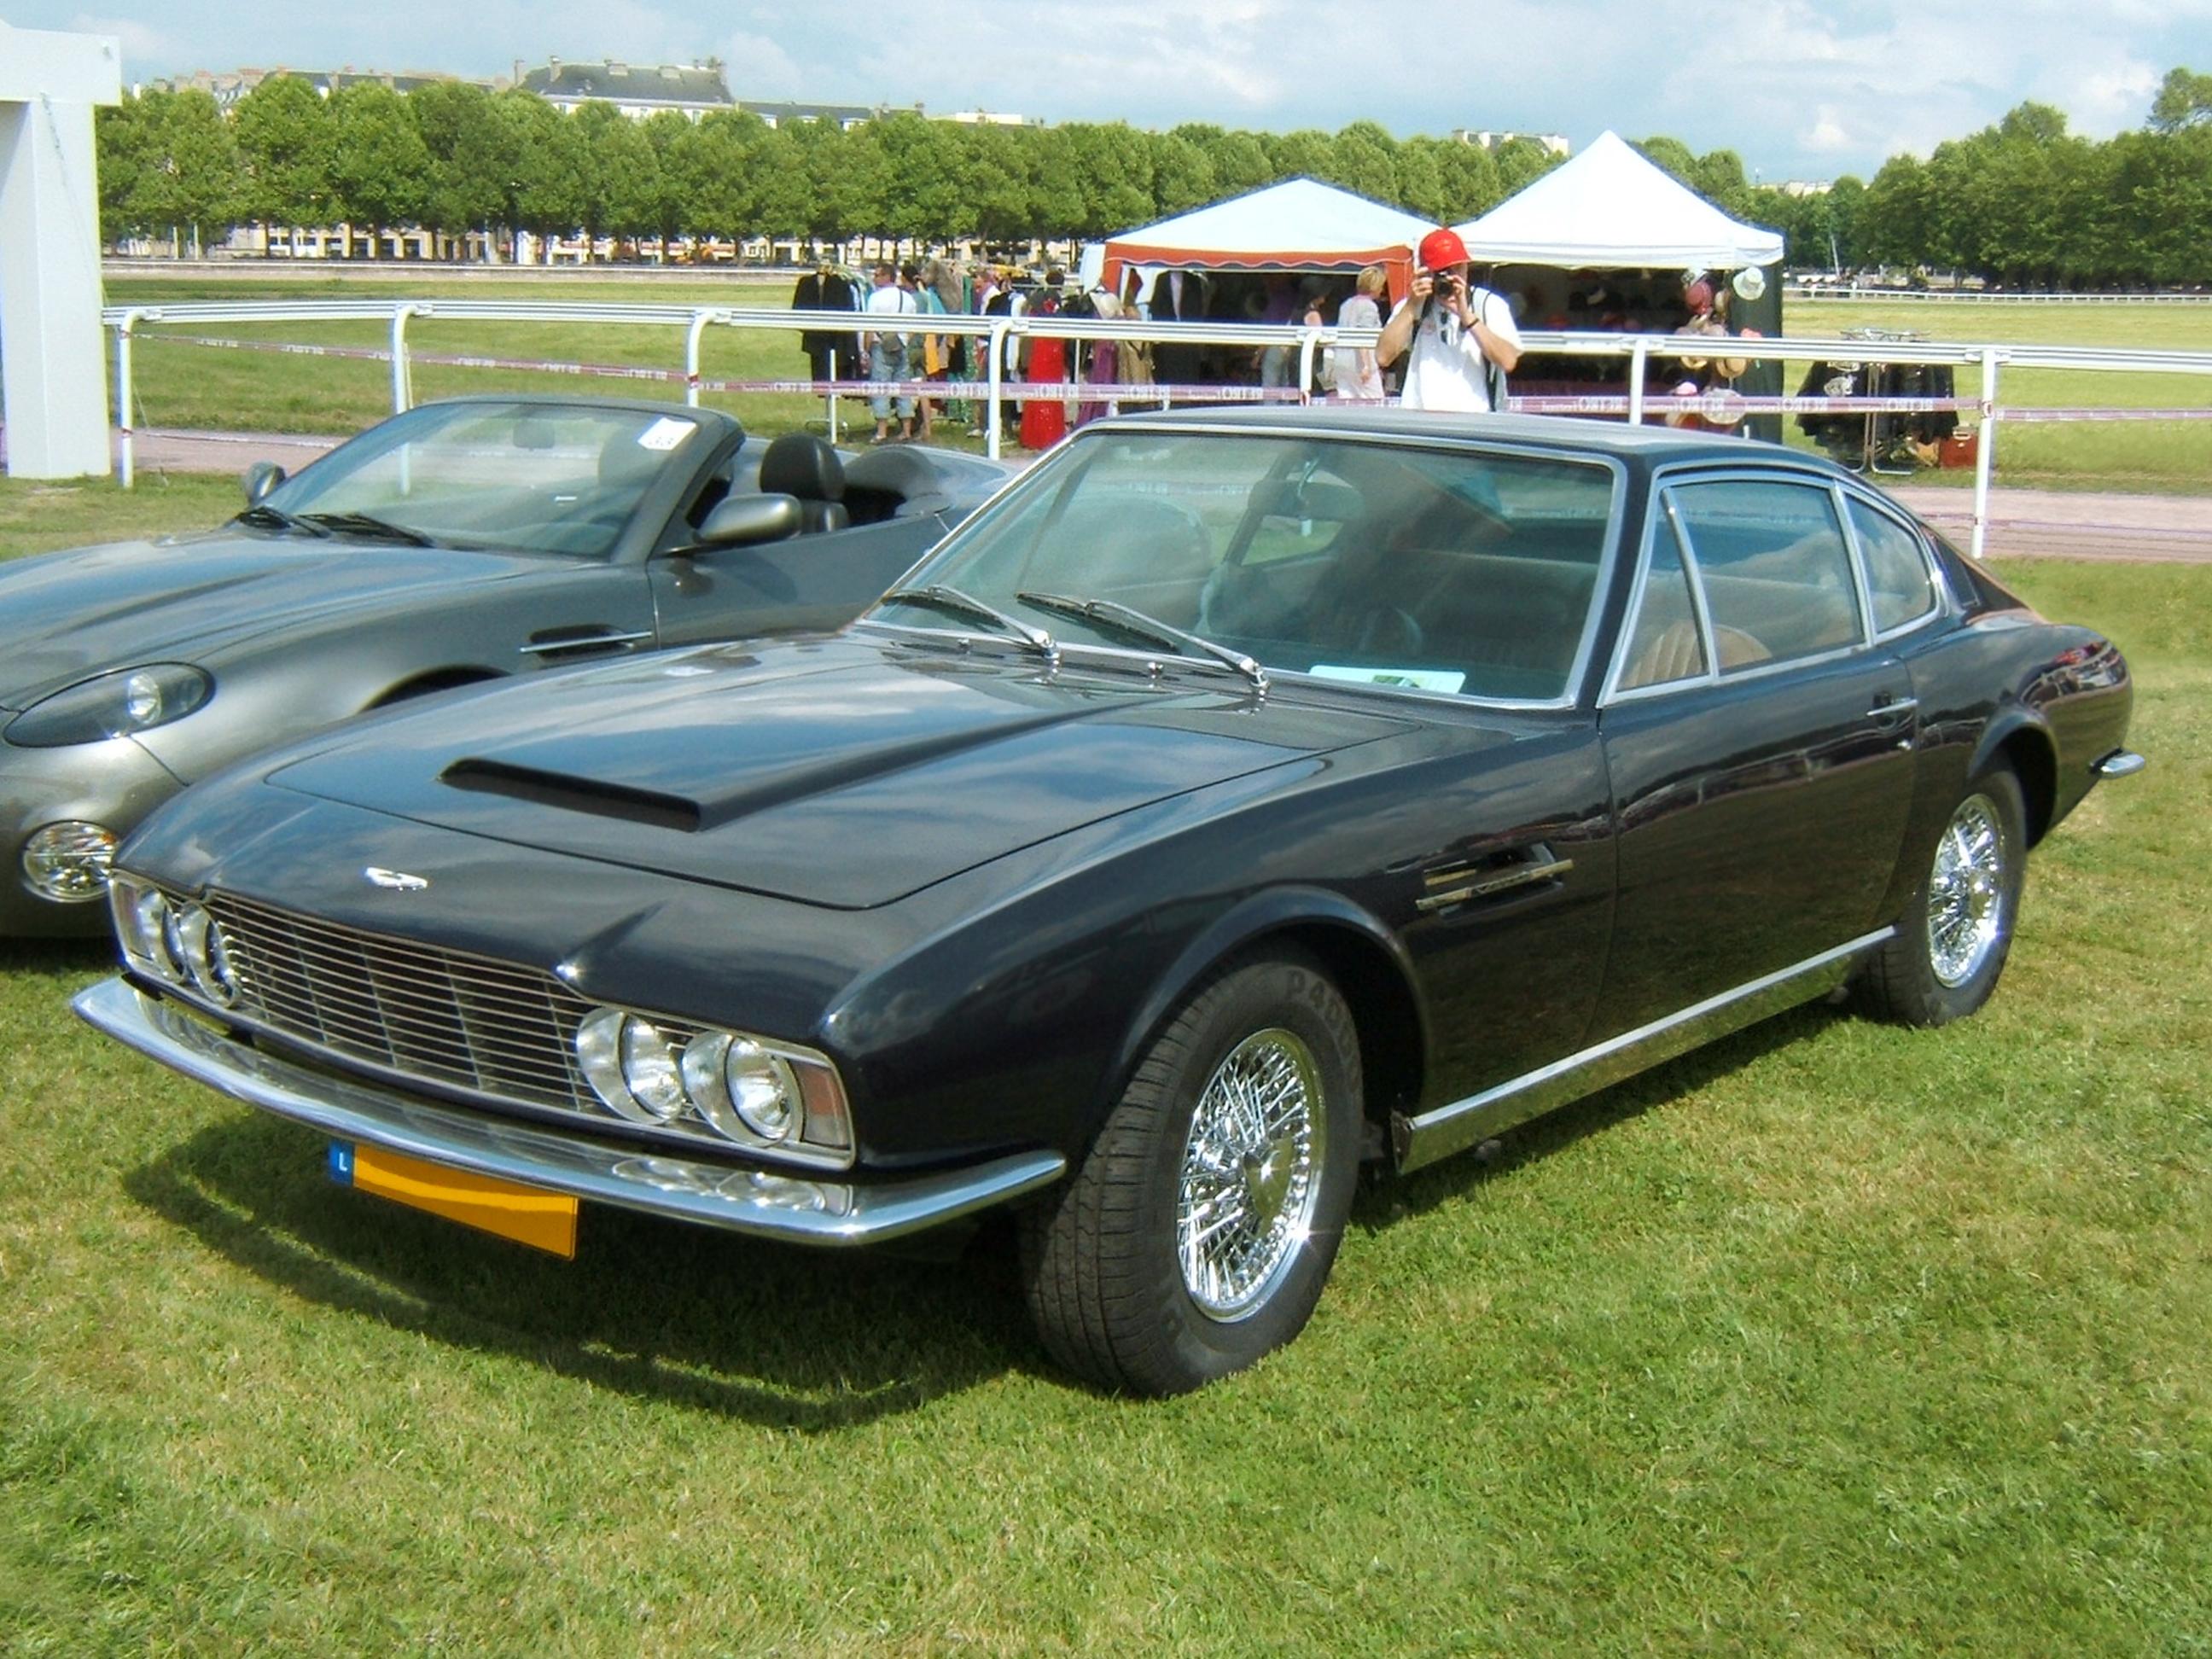 IMCDb.org: 1968 Aston Martin DBS Vantage [5234/R] in